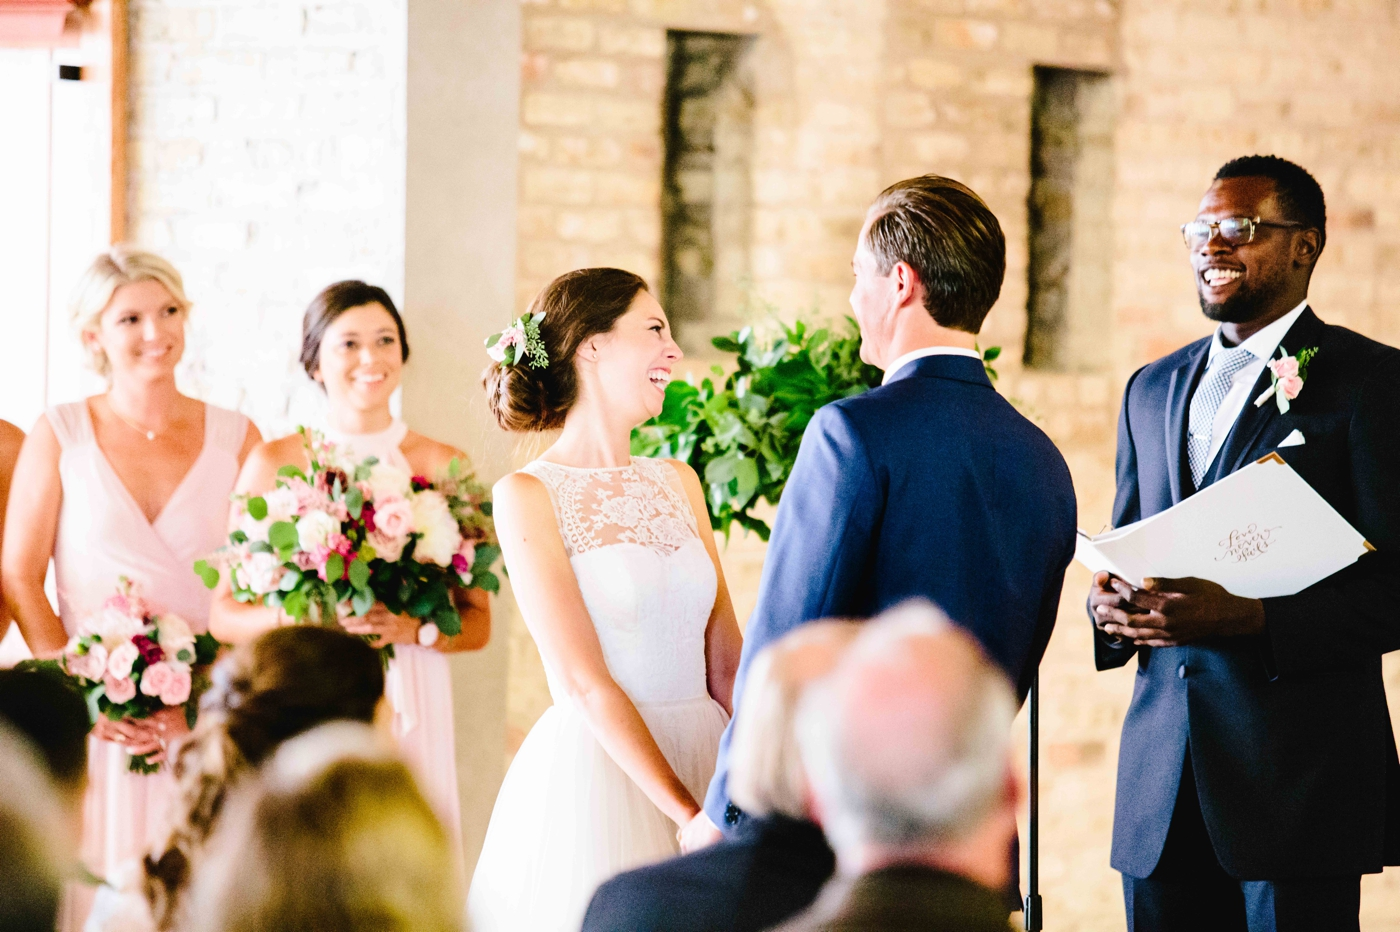 chicago-fine-art-wedding-photography-tyma26